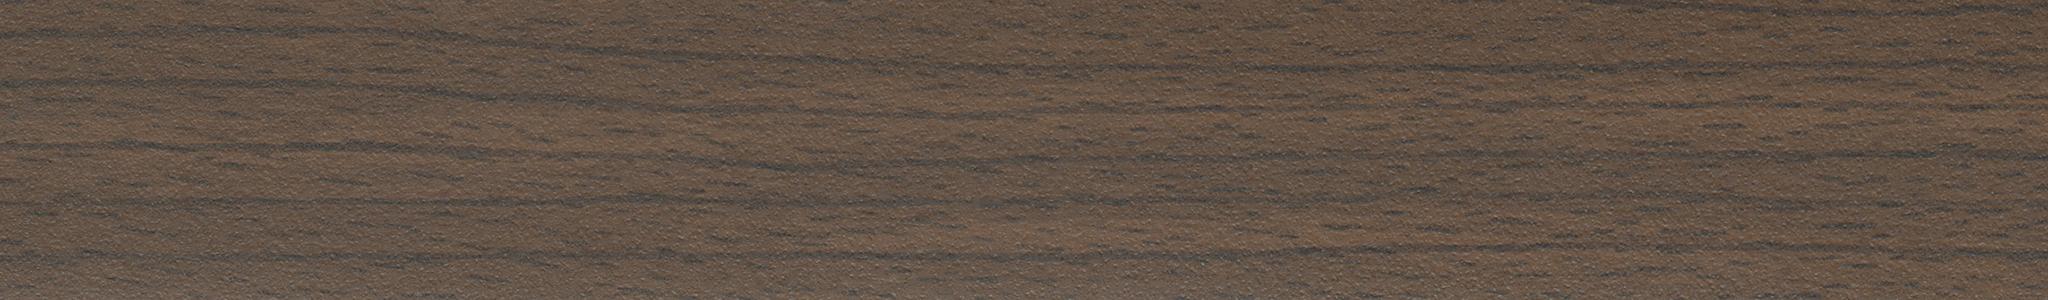 HD 211599 ABS hrana buk čoko perla